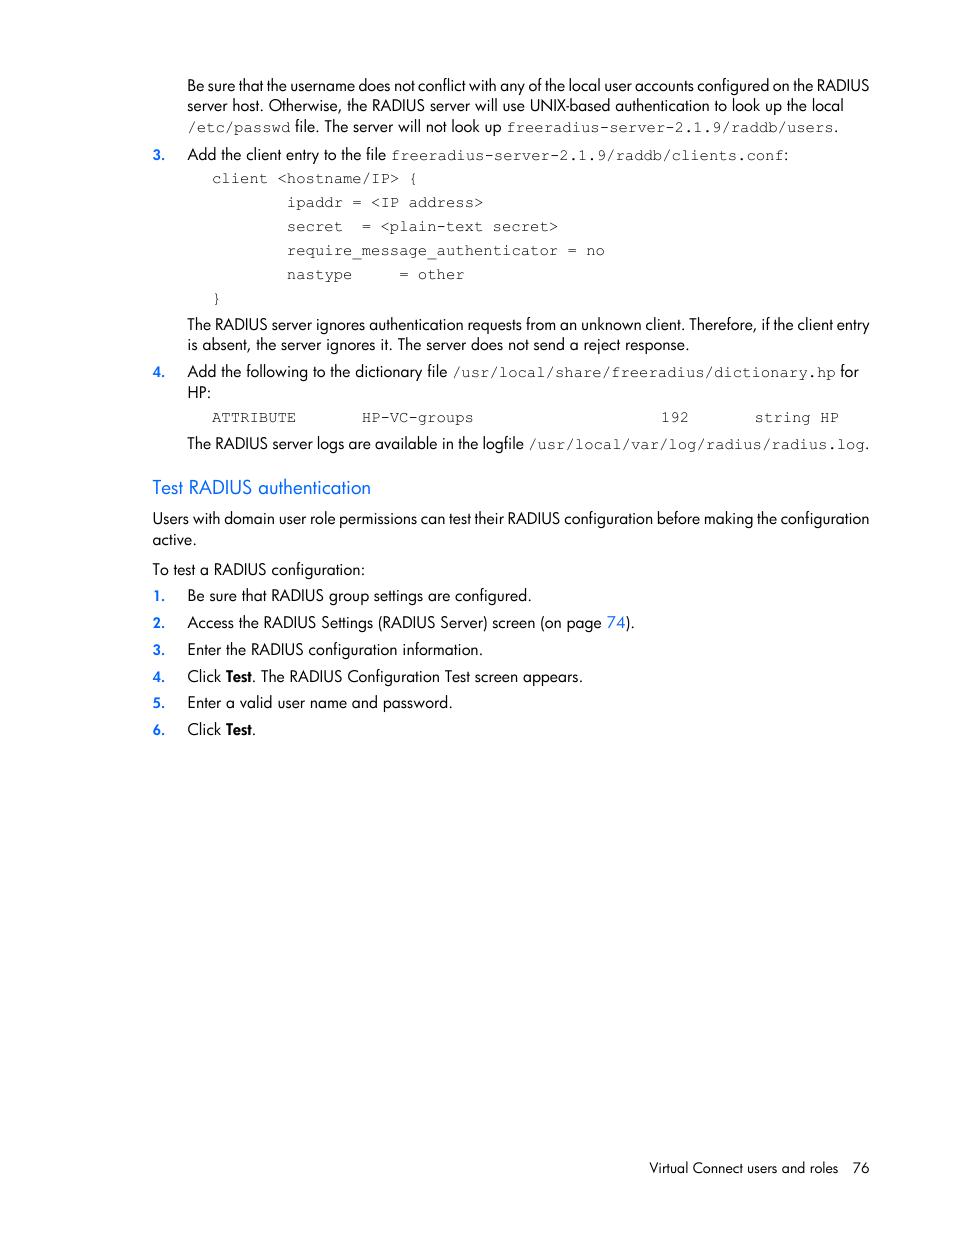 Test radius authentication | HP Virtual Connect 8Gb 20-port Fibre